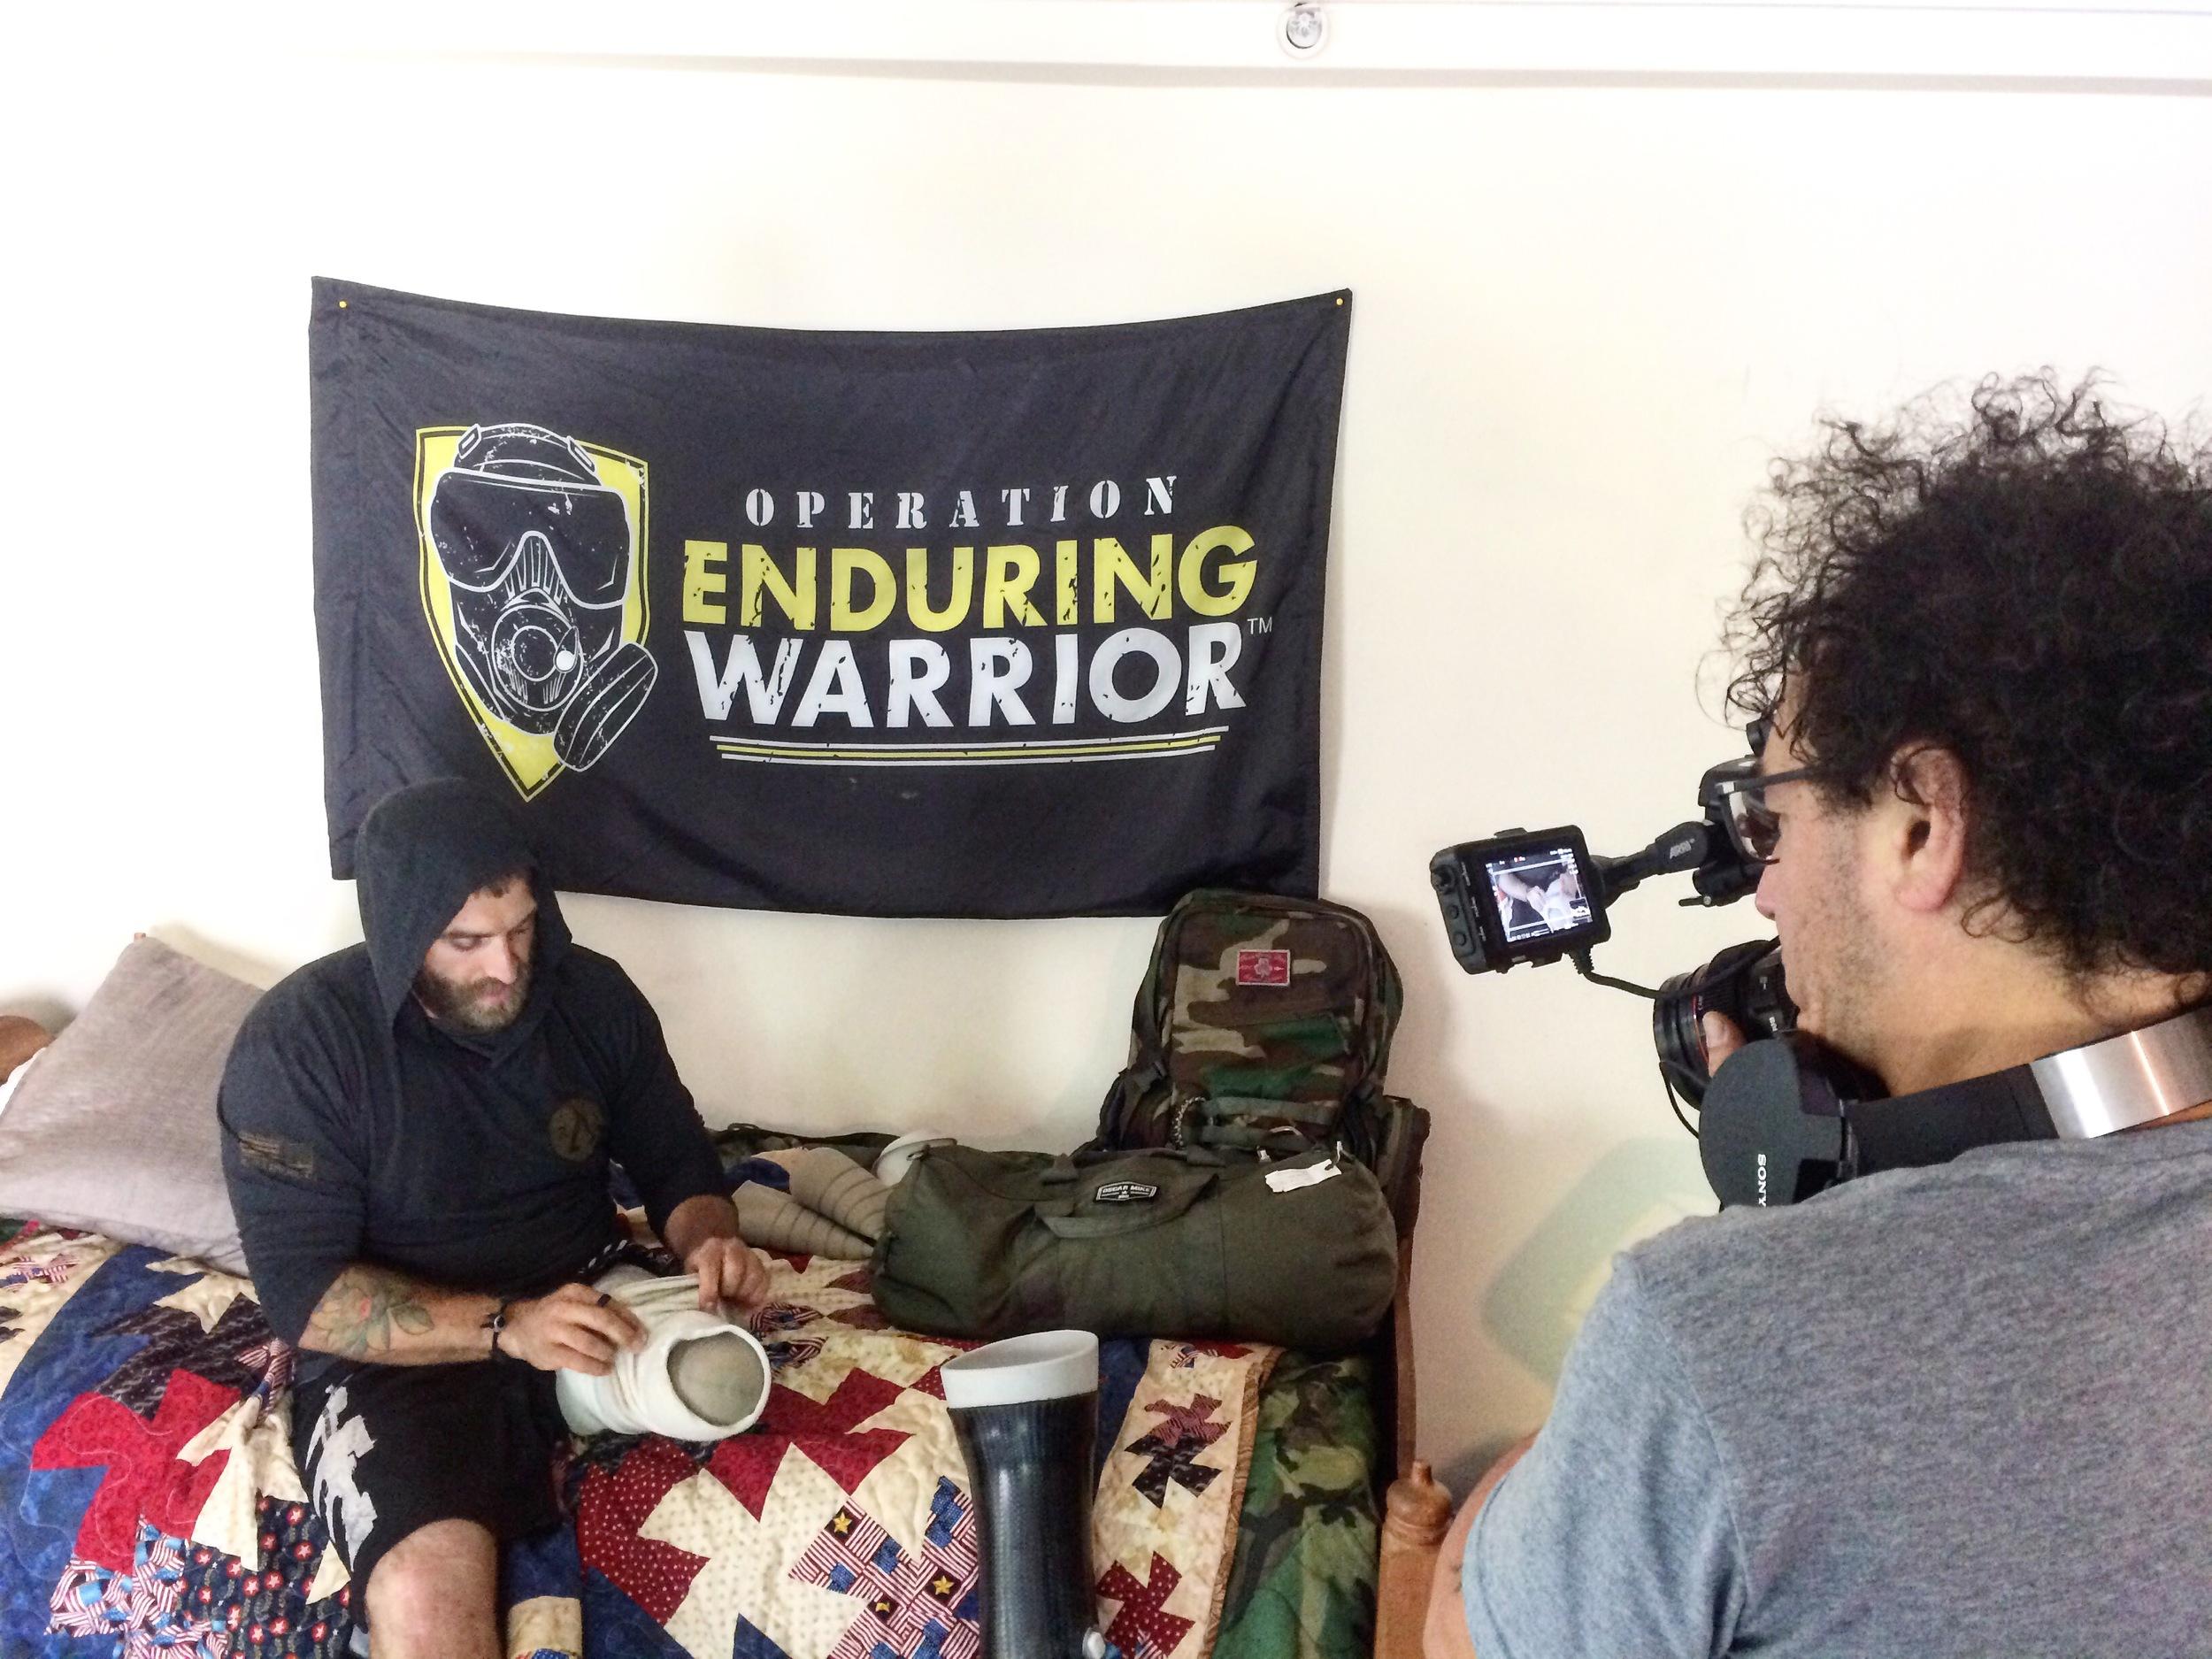 Cinematographer Nicola Raggi capturing Earl during the intimate moment of changing his walking leg to his running leg.